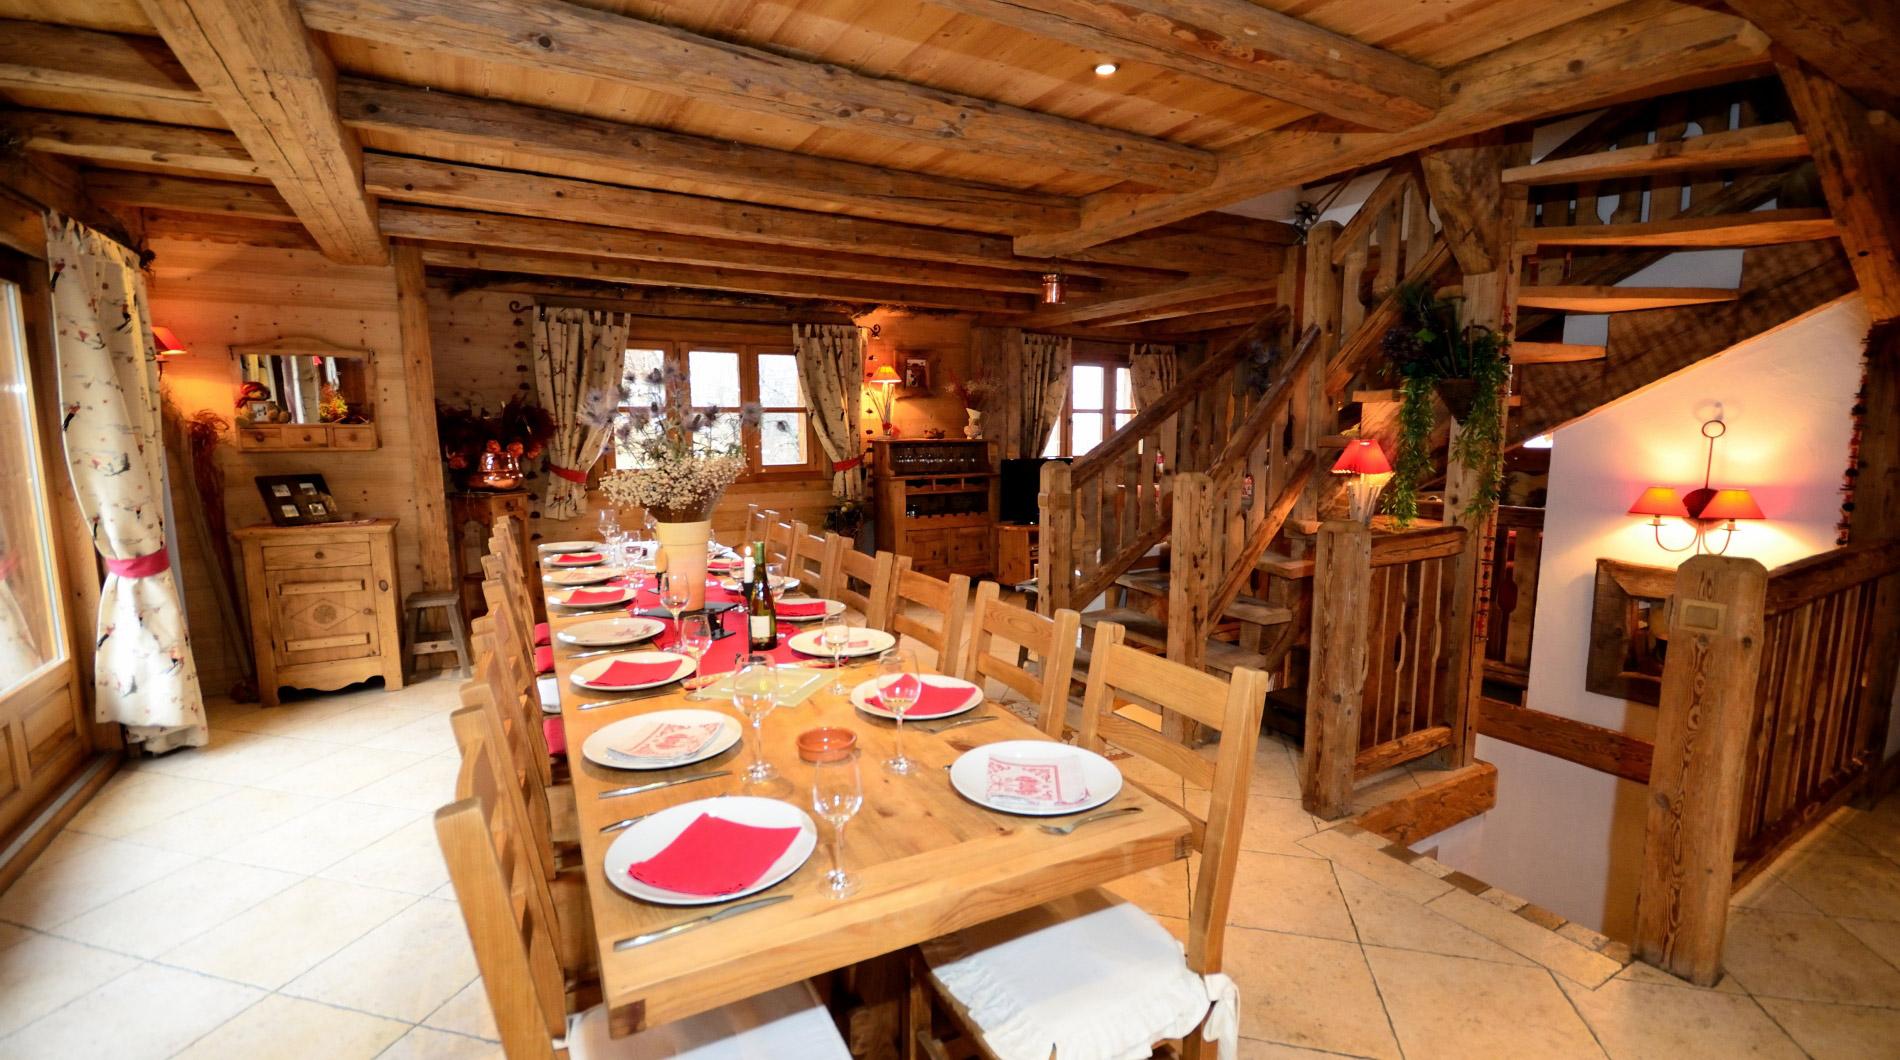 Chalet Jardin d\'Angele, Courchevel 1300 (Le Praz), Three Valleys Ski ...